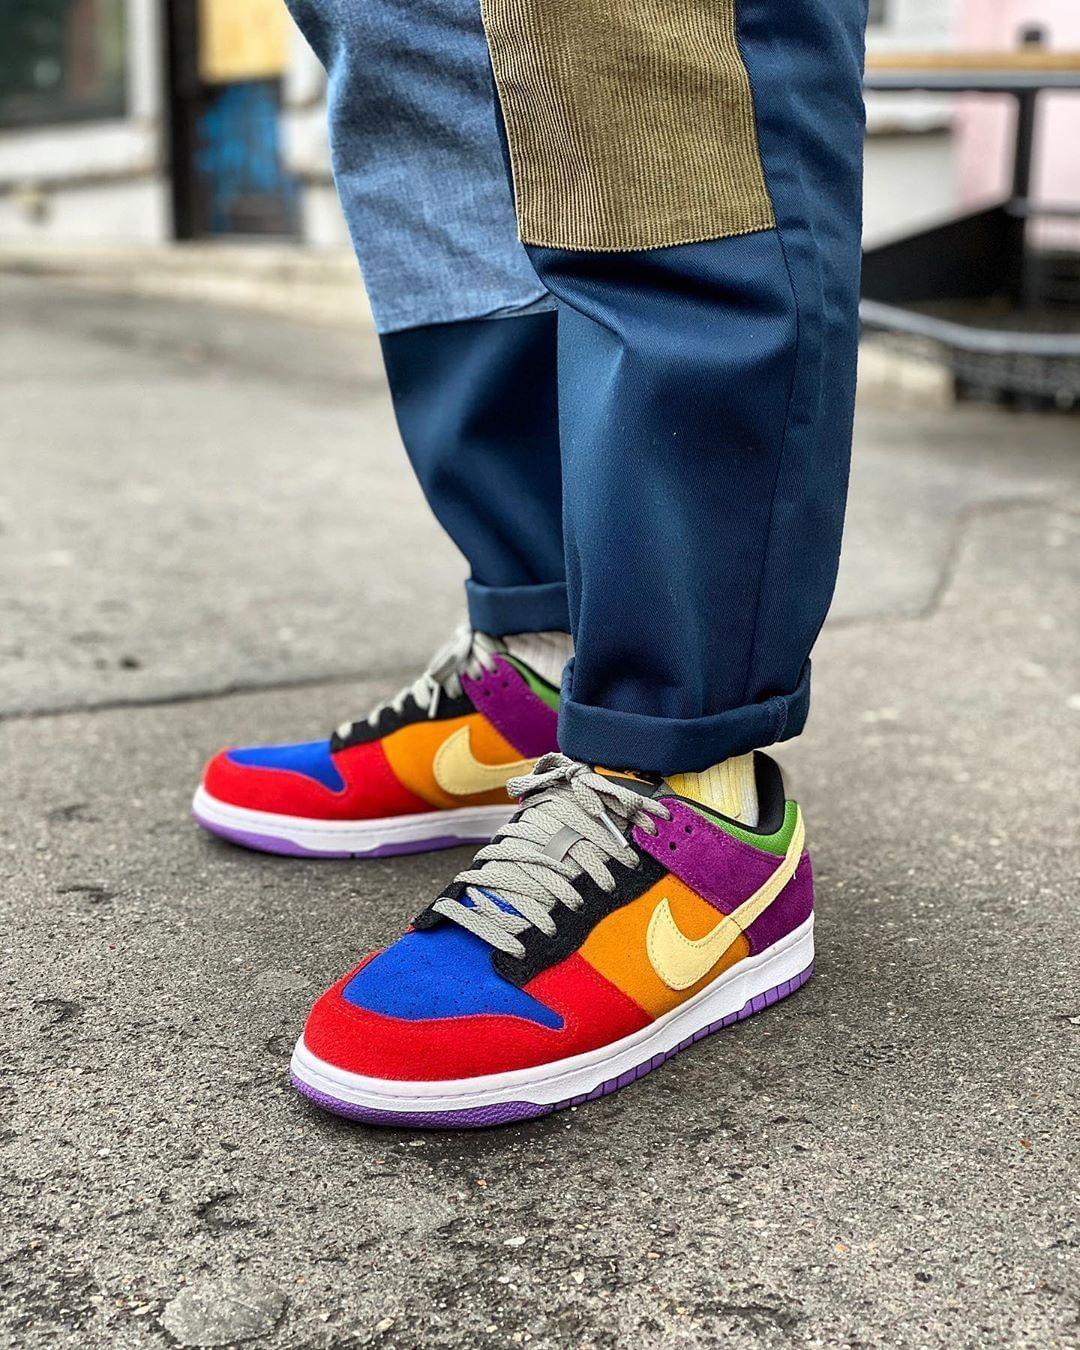 Best High Quality Nike Women/man Shoes in 2020 Nike